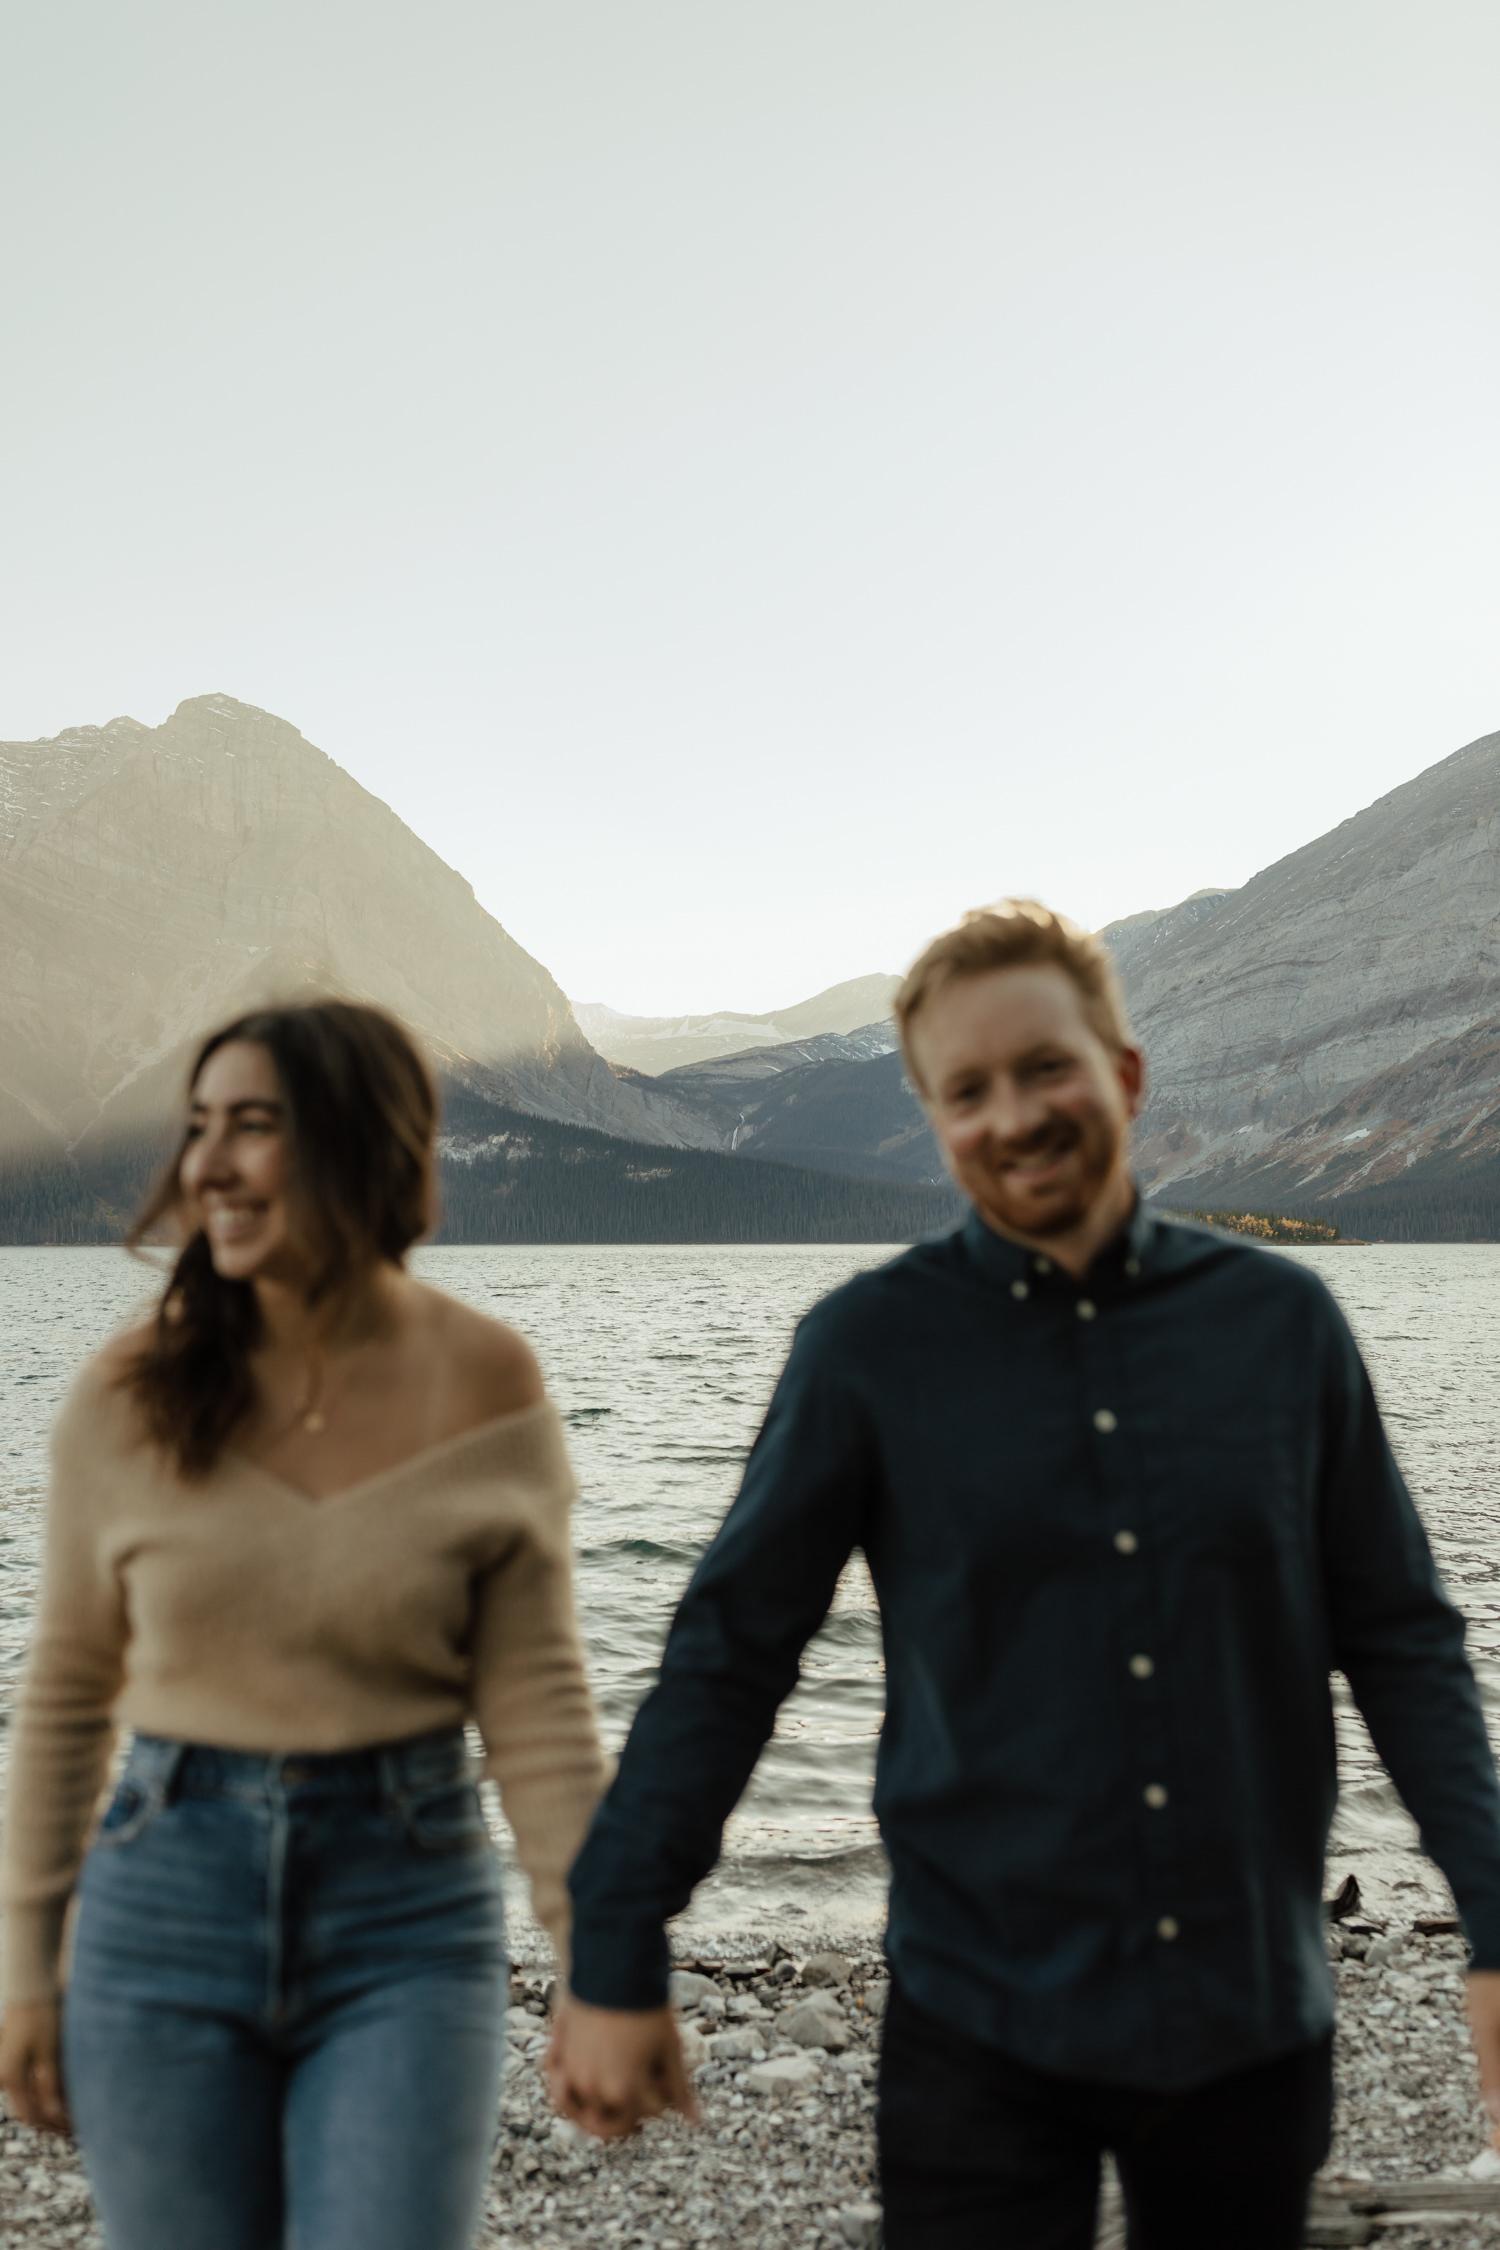 Fall Couple Session at Upper Kananaskis Lake in Alberta, Canada